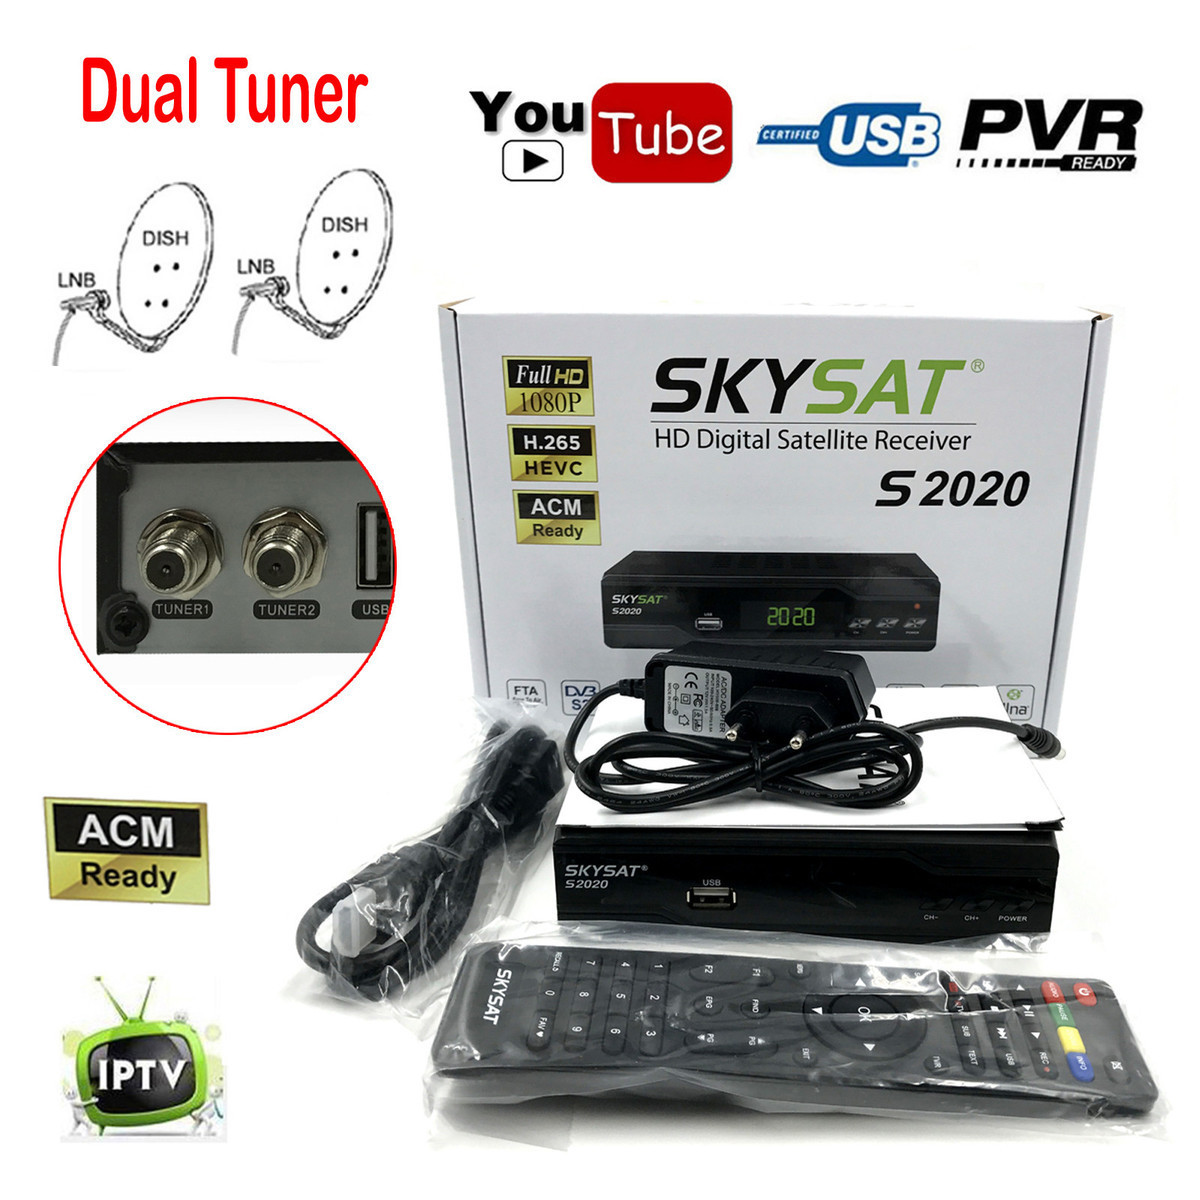 [Genuine] SKYSAT S2020 H.265 Twin Tuner DVB-S2 Ricevitore Satellitare IKS SKS server più stabile Anno ACM Recettore Supporto IPTV M3U